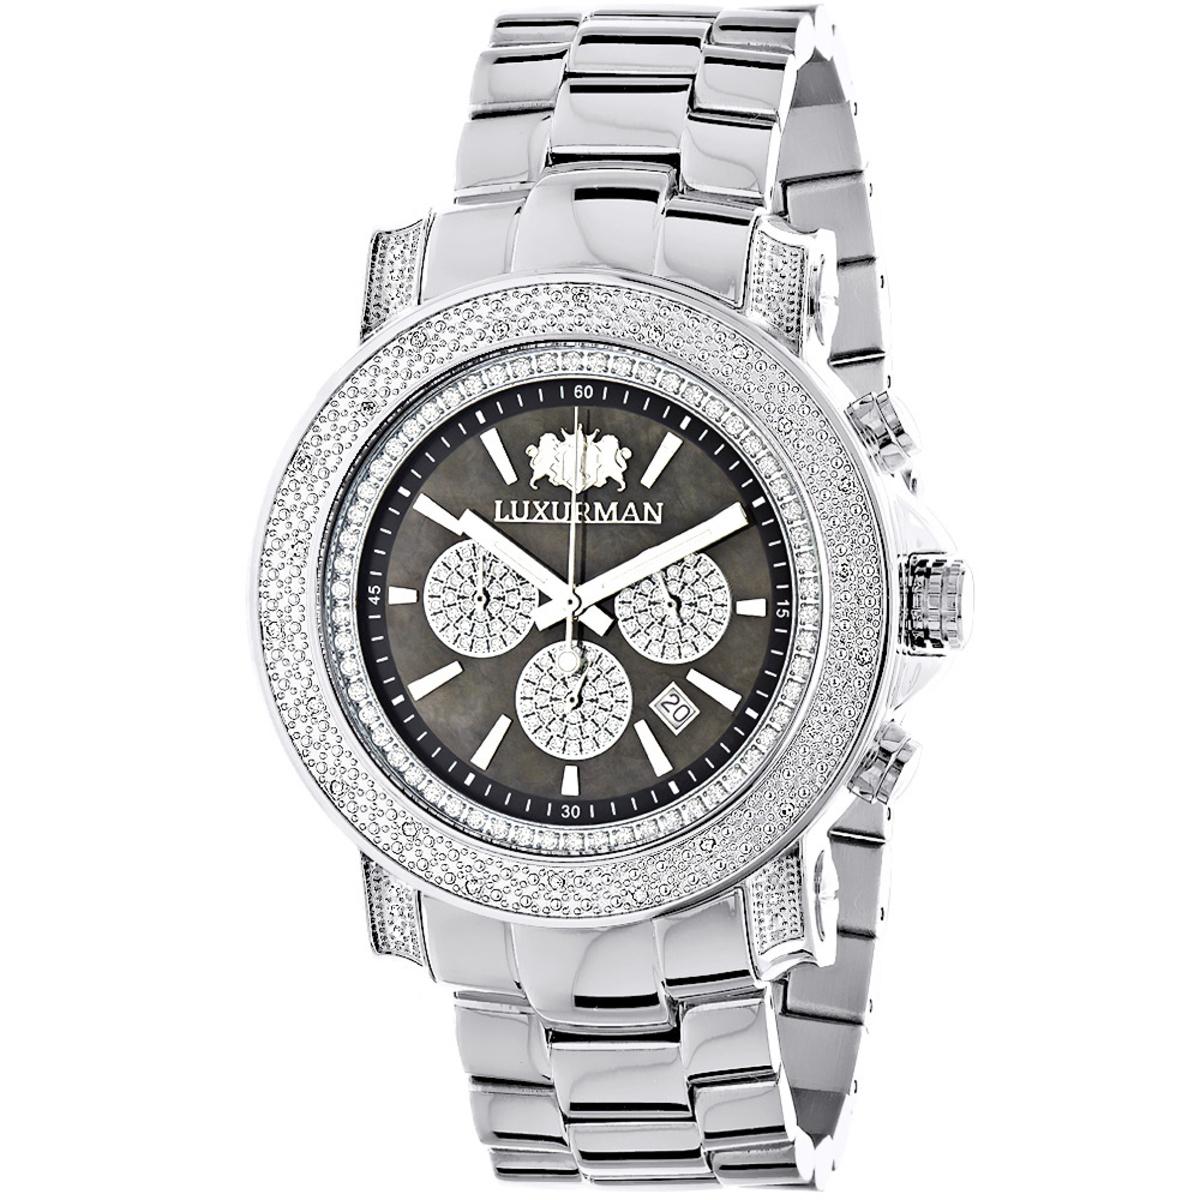 Heavy Mens Diamond Watch Luxurman Escalade 0.75ct Black MOP